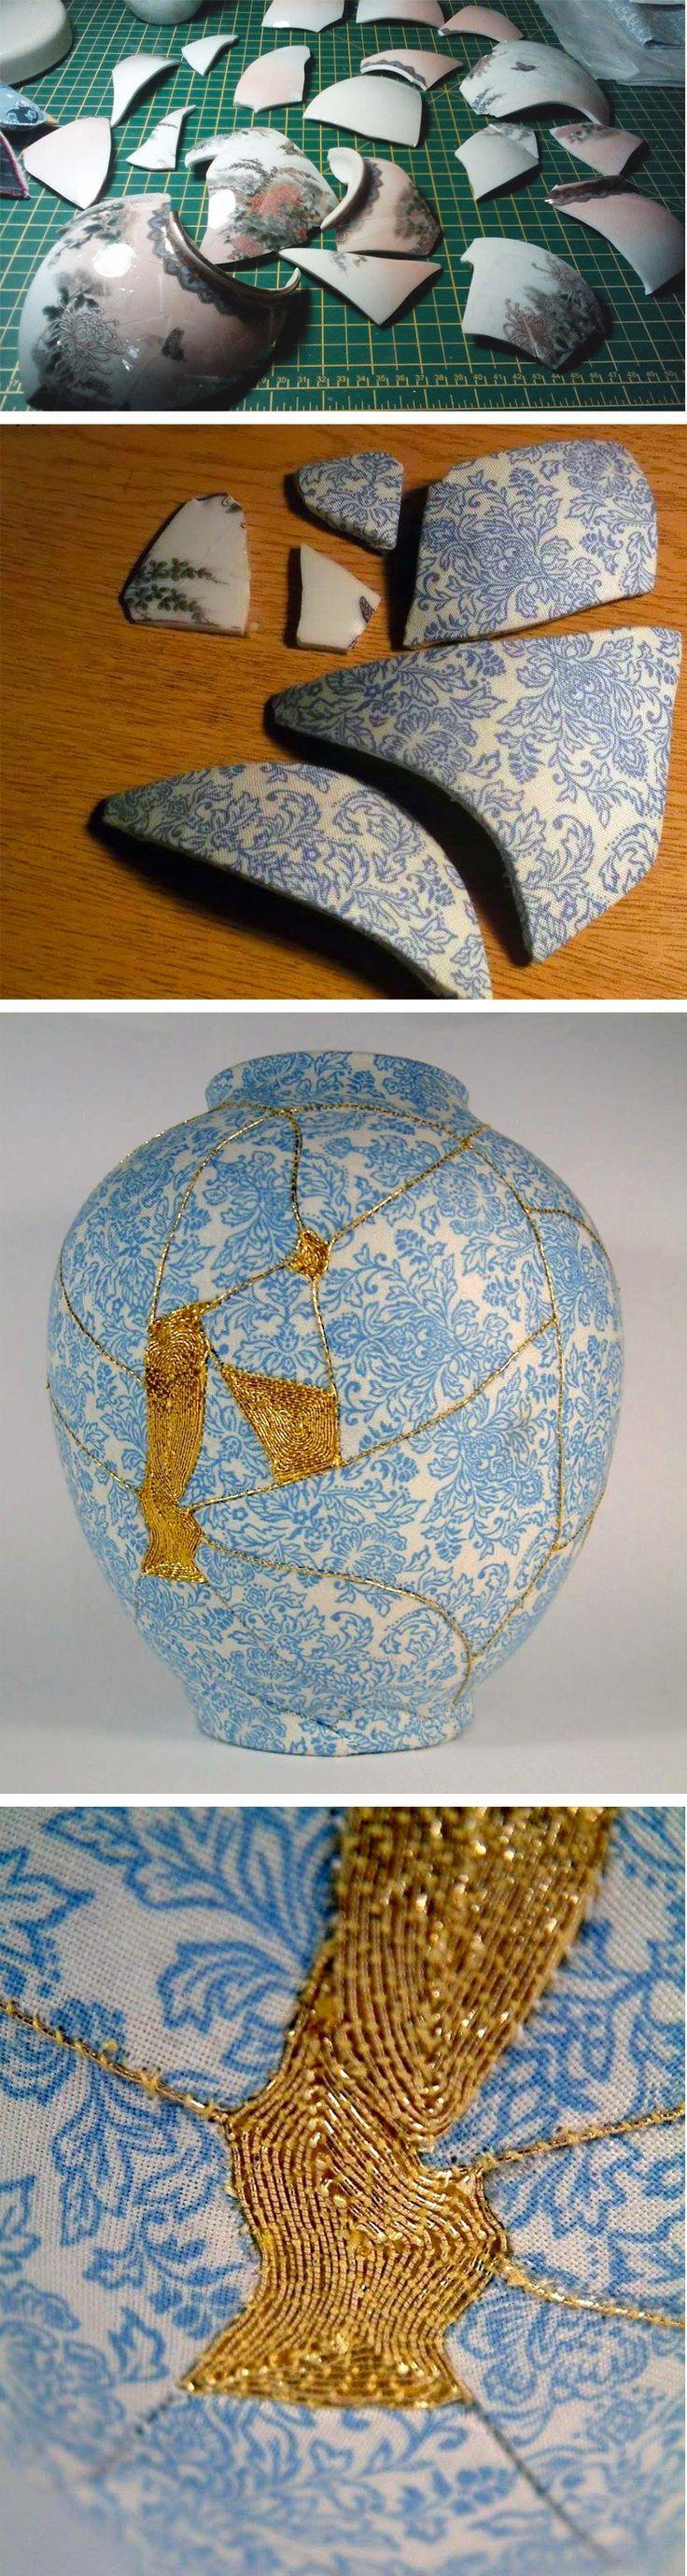 137 best kintsugi images on pinterest ceramic art porcelain and artist mimics japanese kintsugi technique to repair broken vases with embroidery reviewsmspy